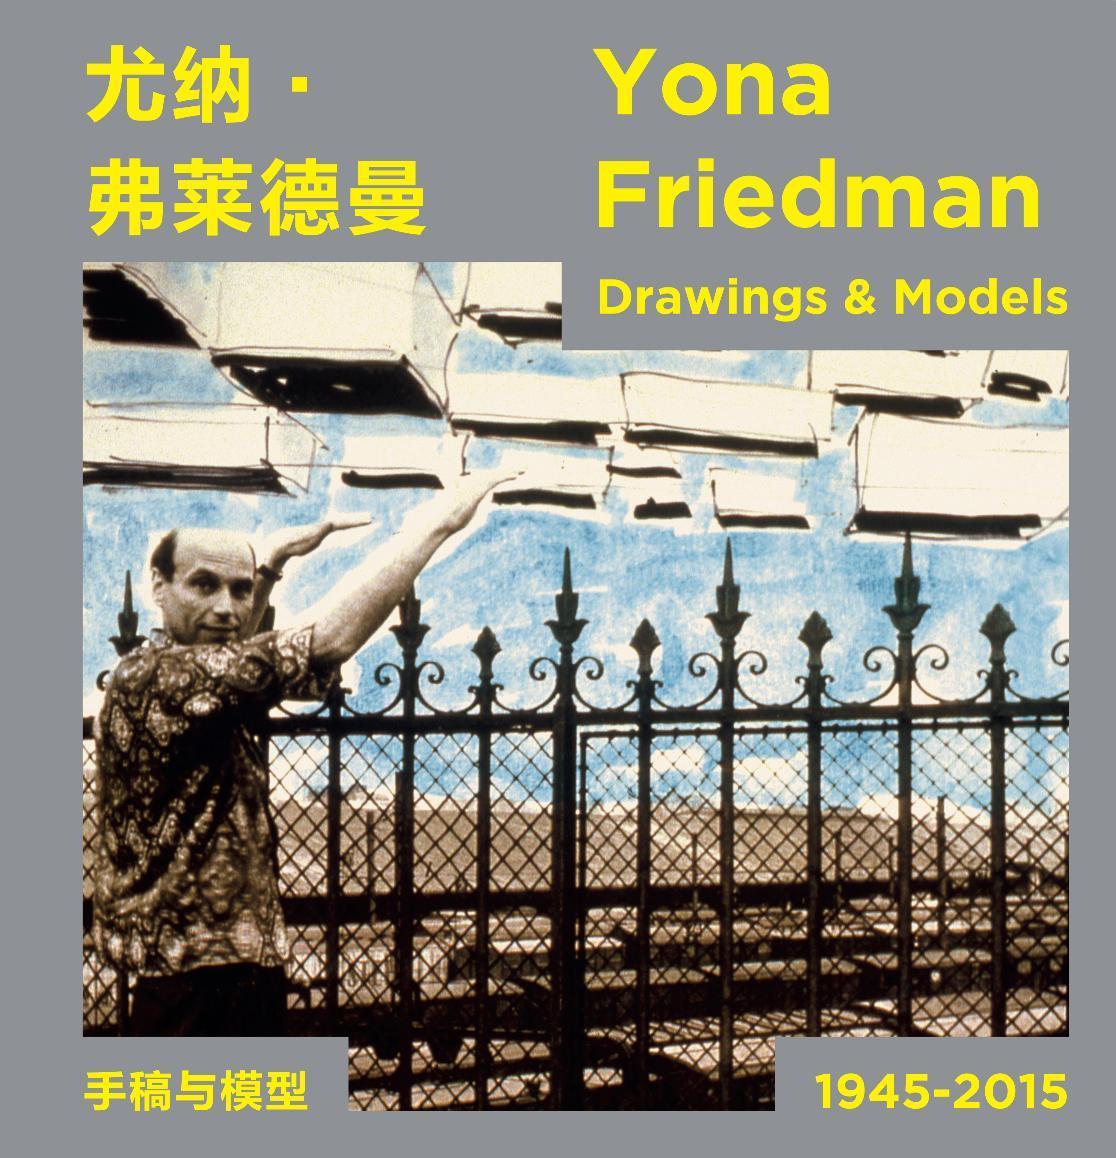 DRAWINGS & MODELS - YONA FRIEDMAN - 1945-2010